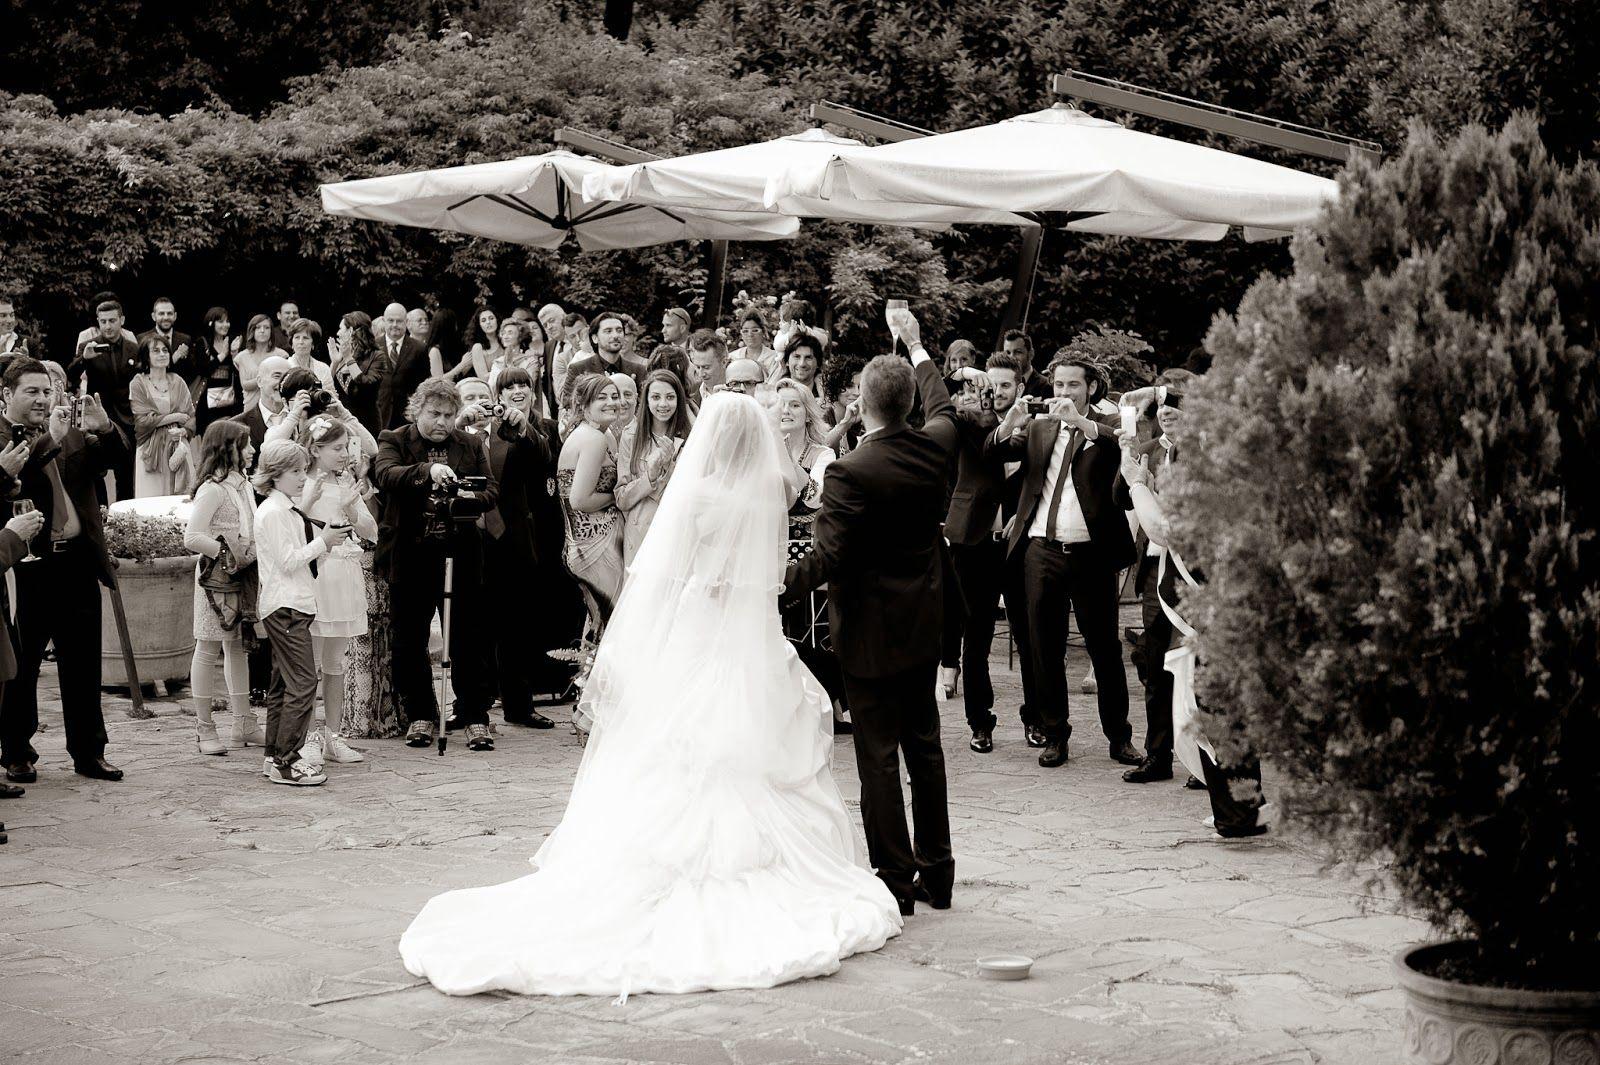 Italy photo wedding: #wedding in #Tuscany